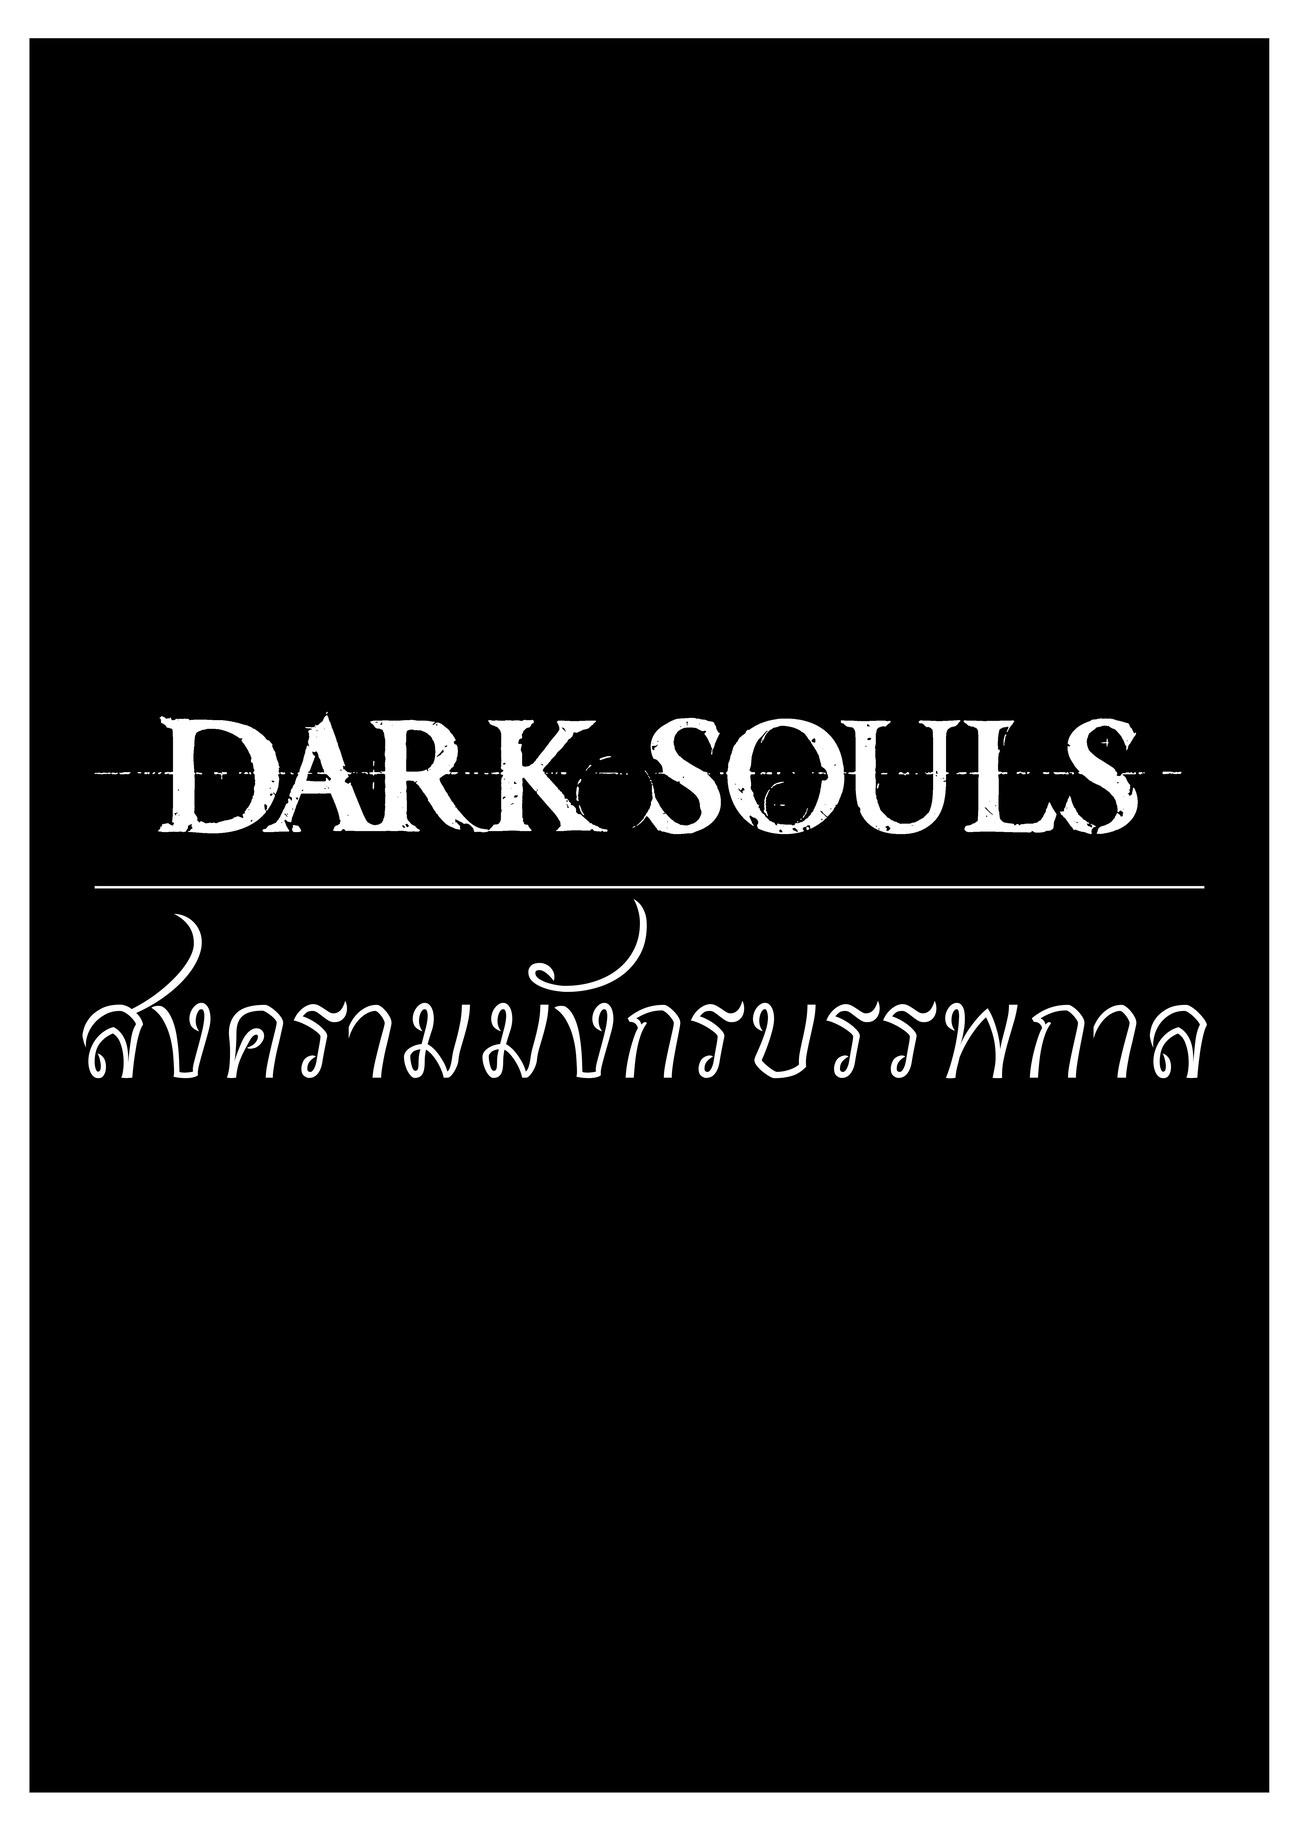 Dark souls-ตอนที่ 1